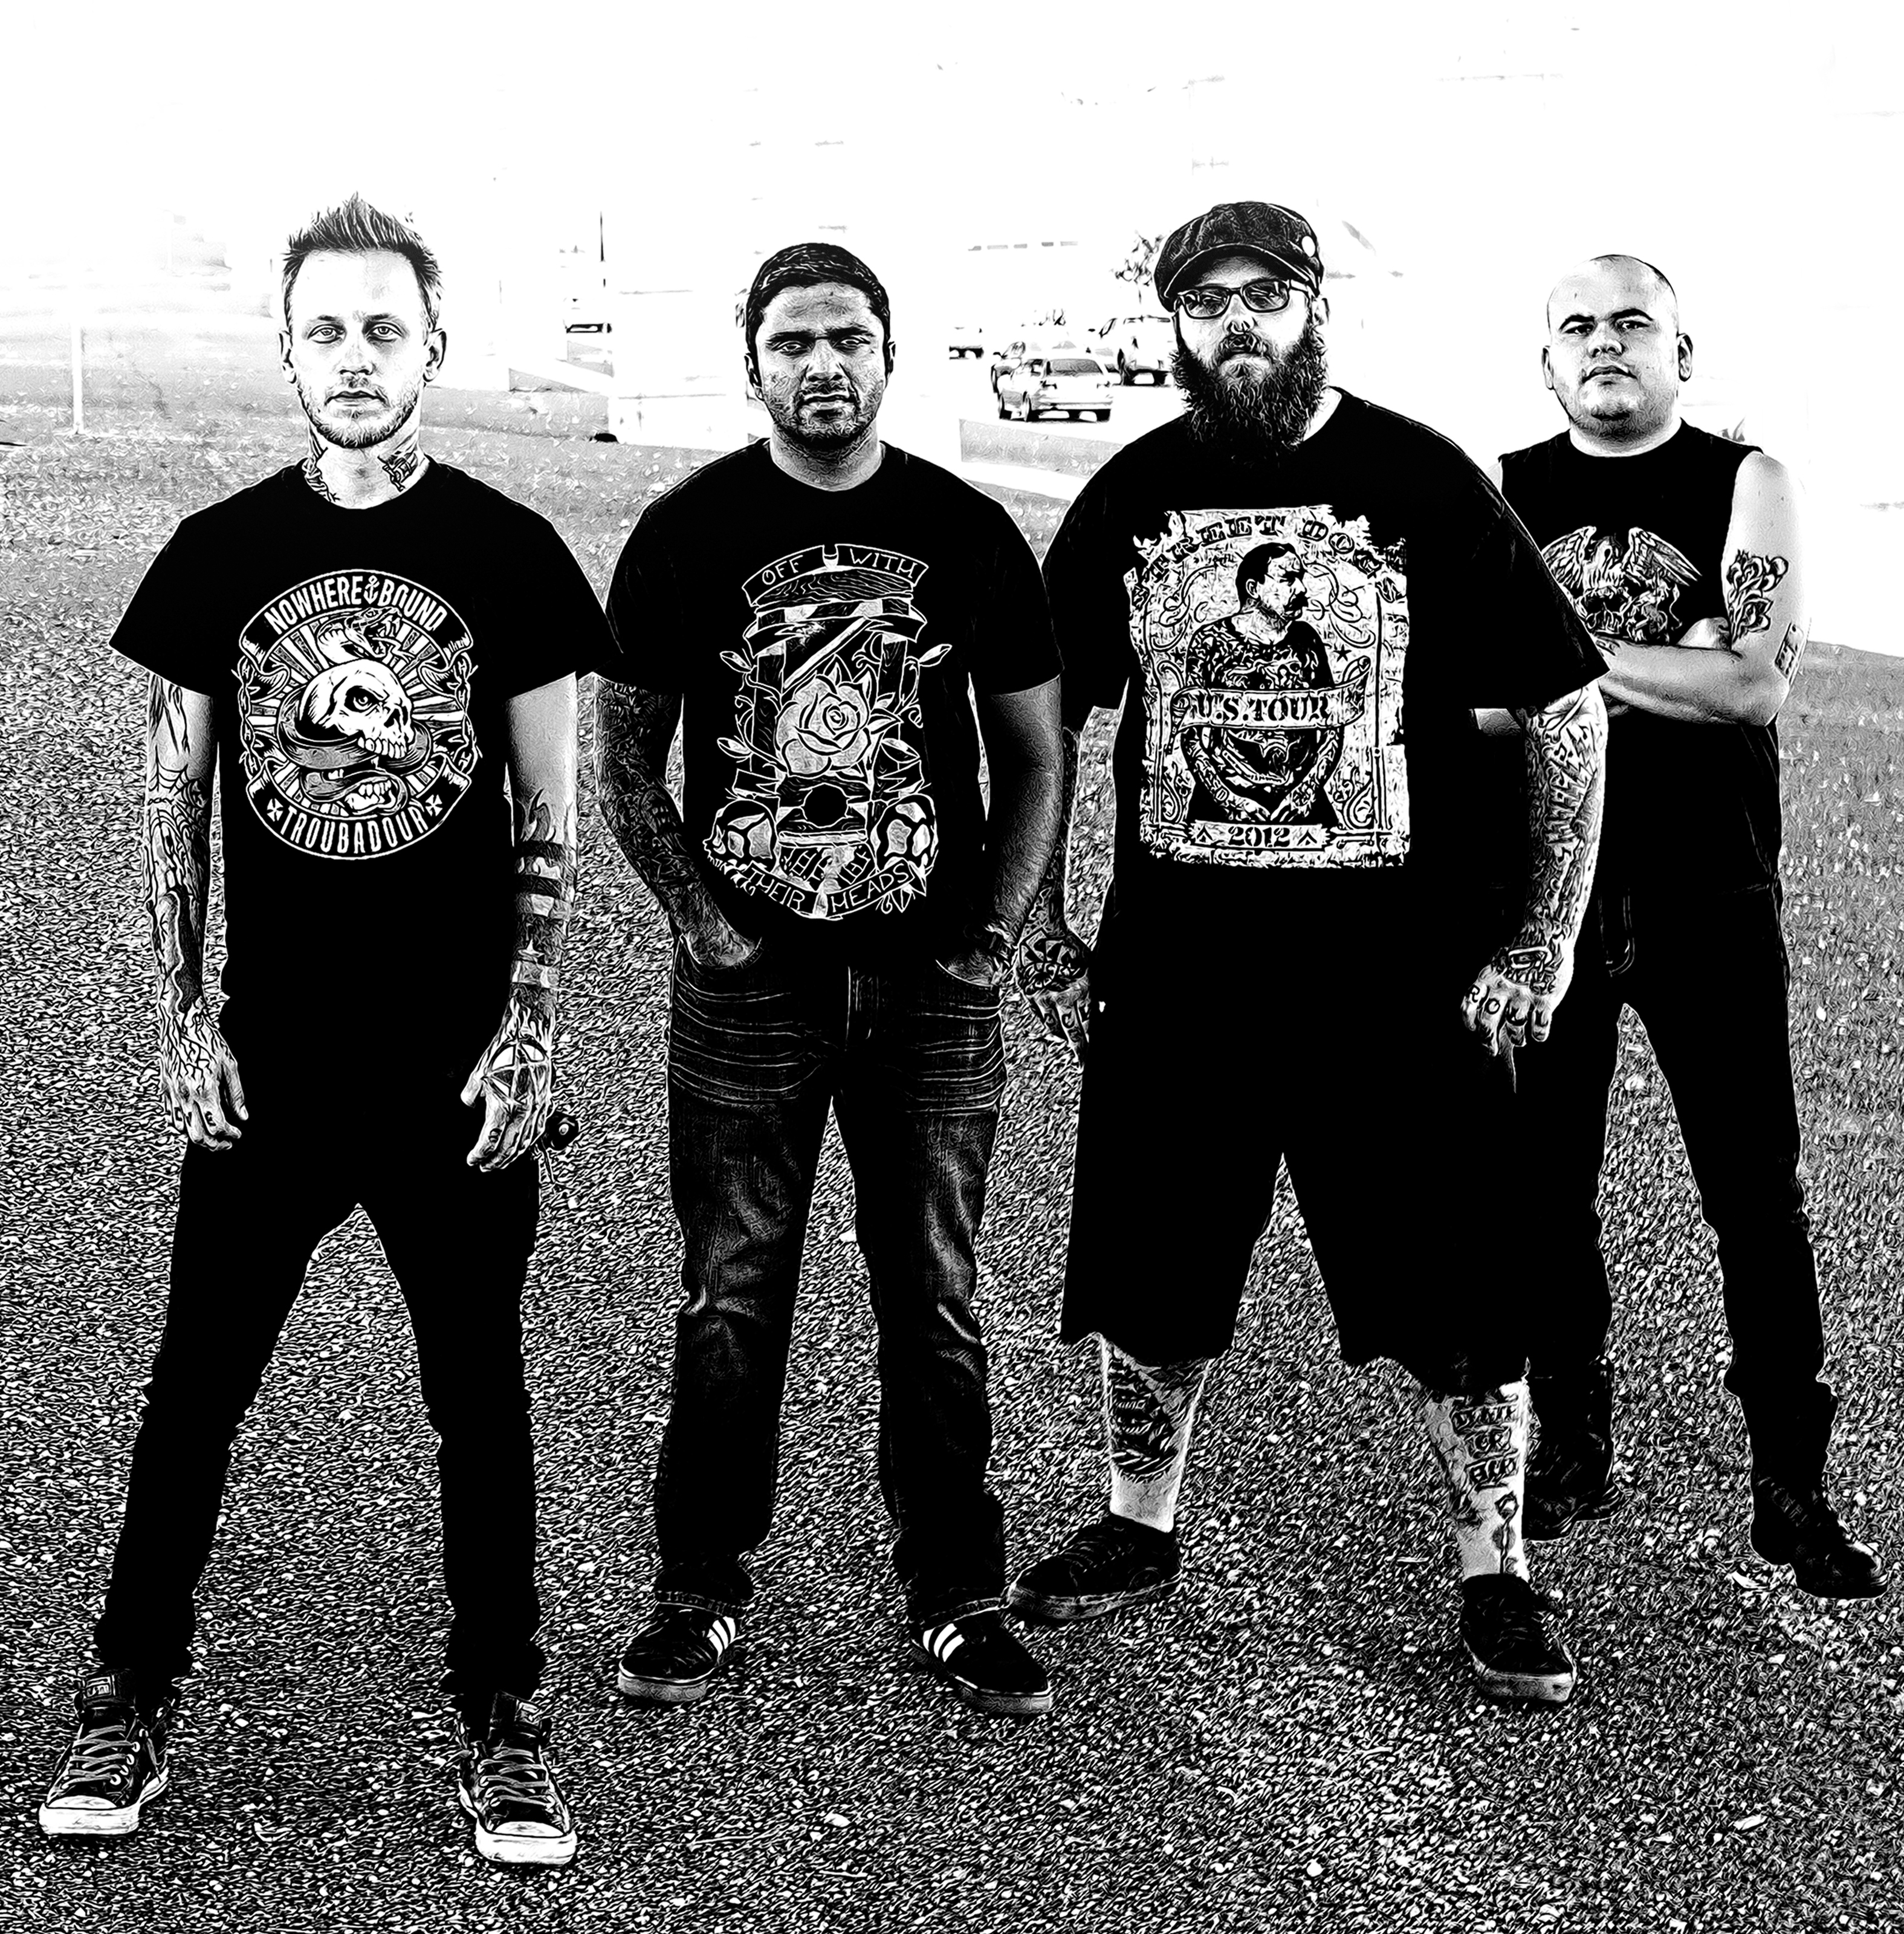 Black t shirt reverbnation - Black T Shirt Reverbnation 50